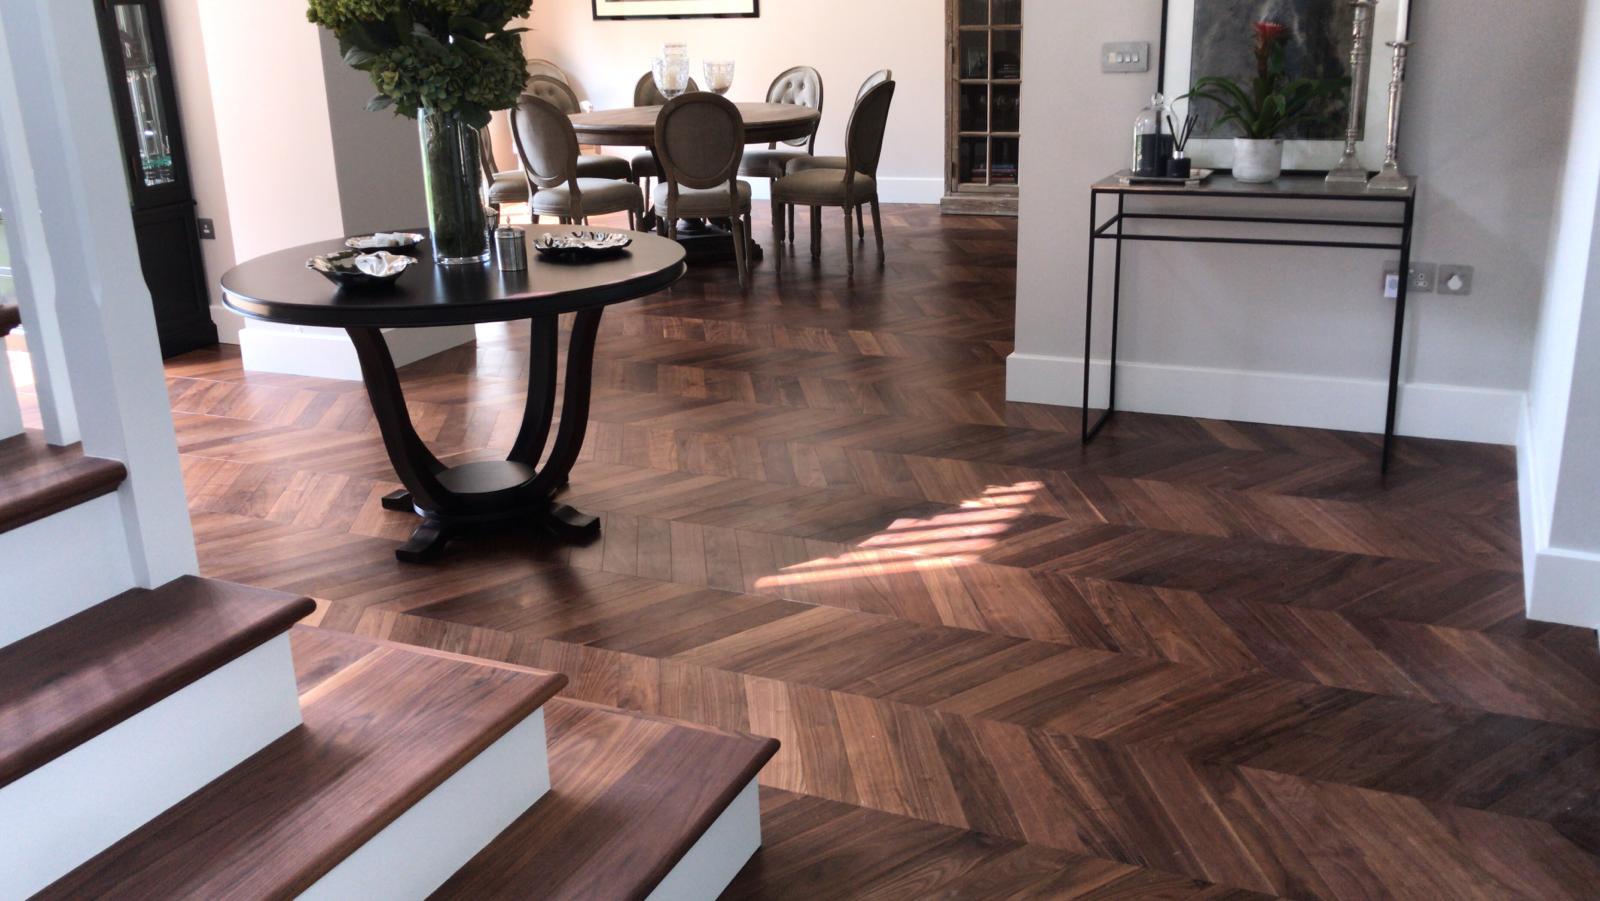 American Black walnut engineered flooring in an apartment